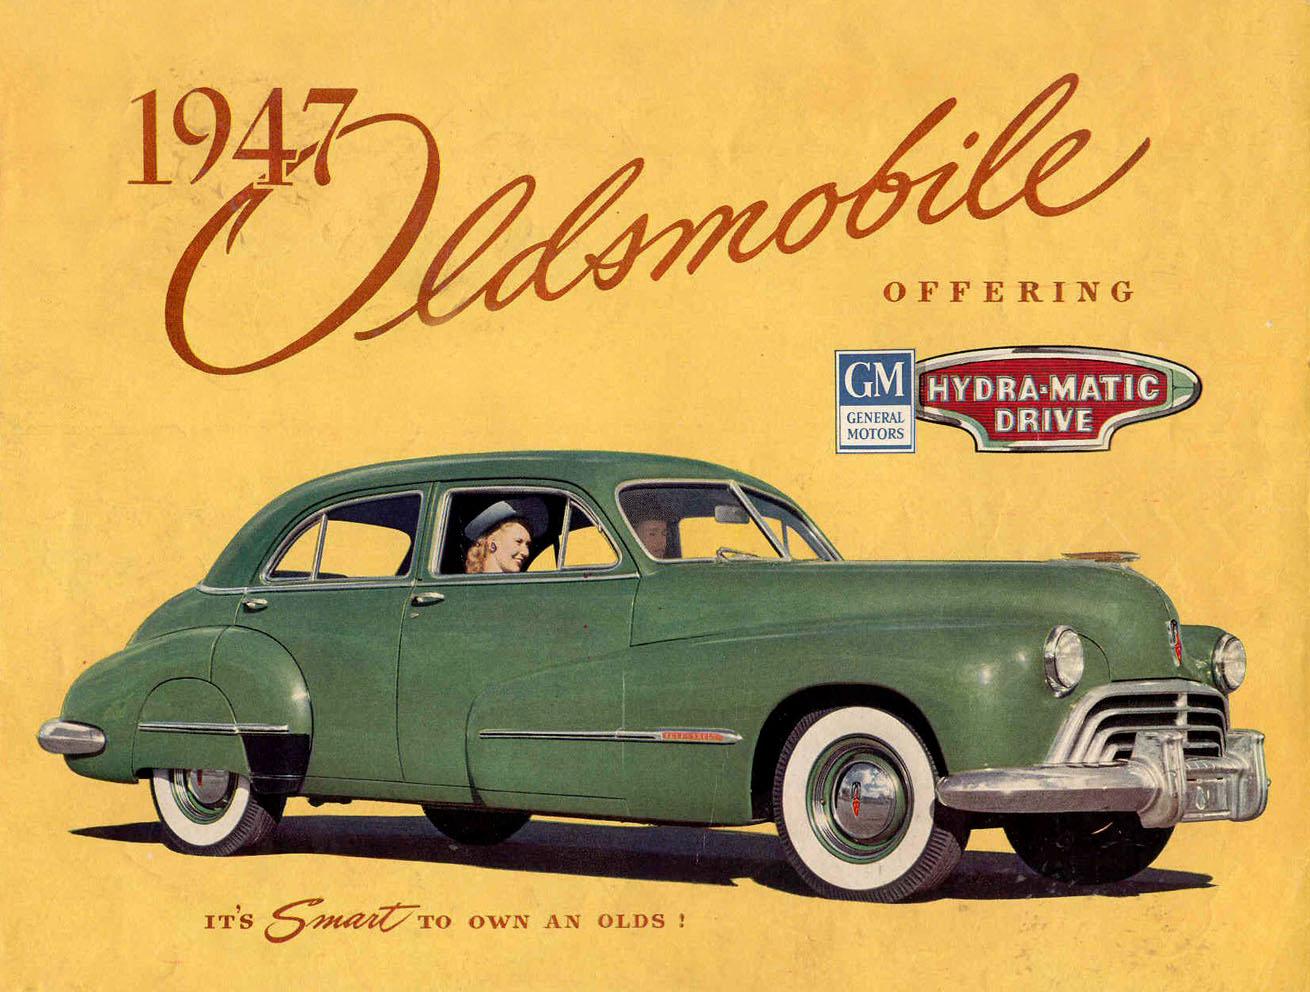 Amazing 1947 Oldsmobile Brochure · Car AdvertisingVintage ... Pictures